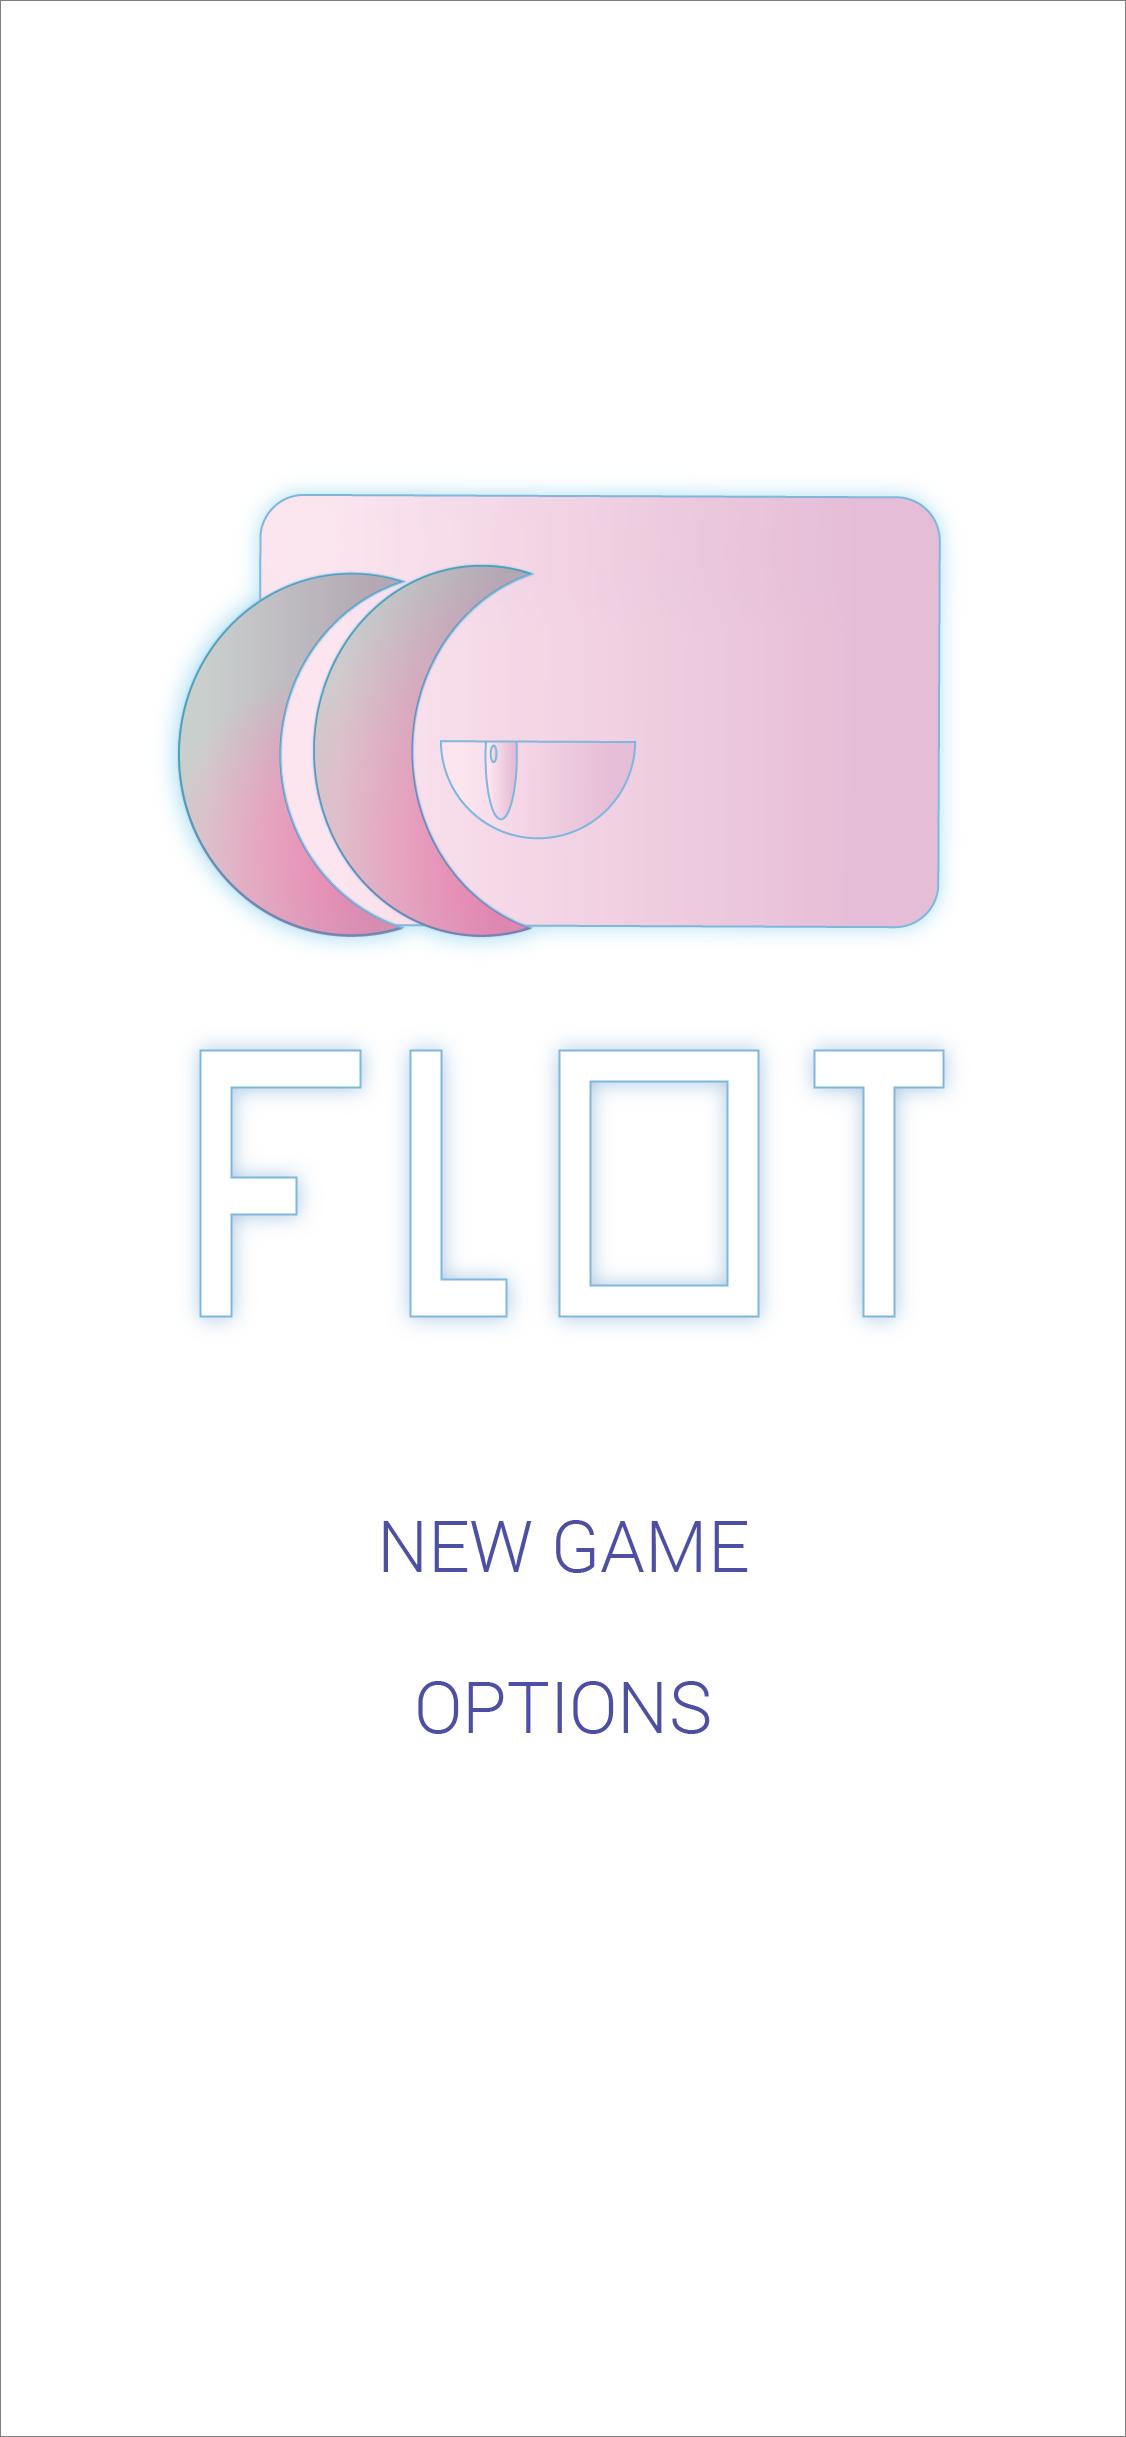 UI design for Flot prototype